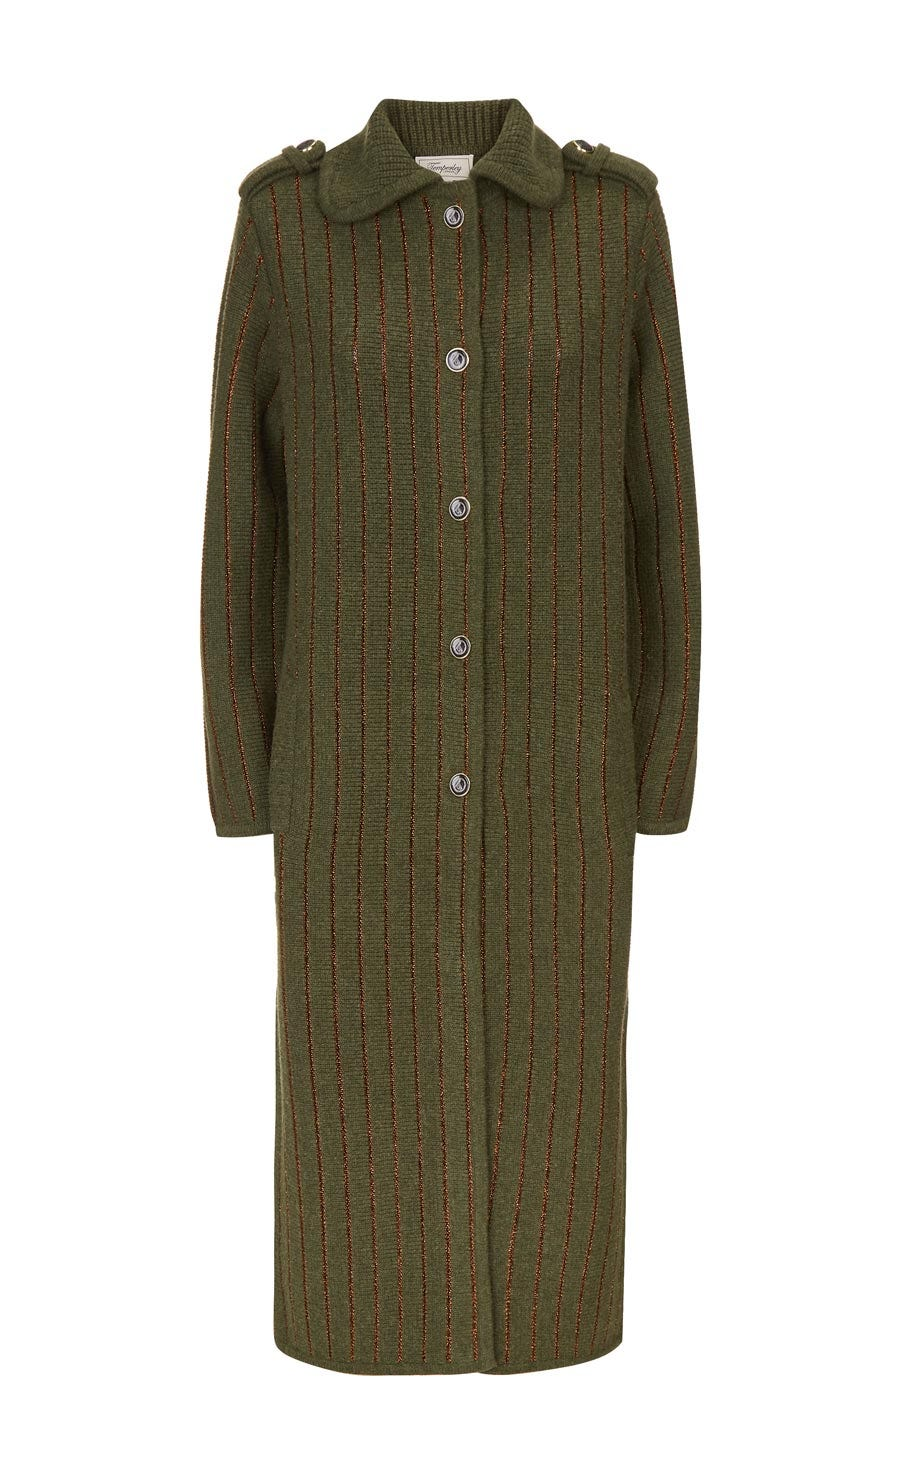 Whistle Knit Coat